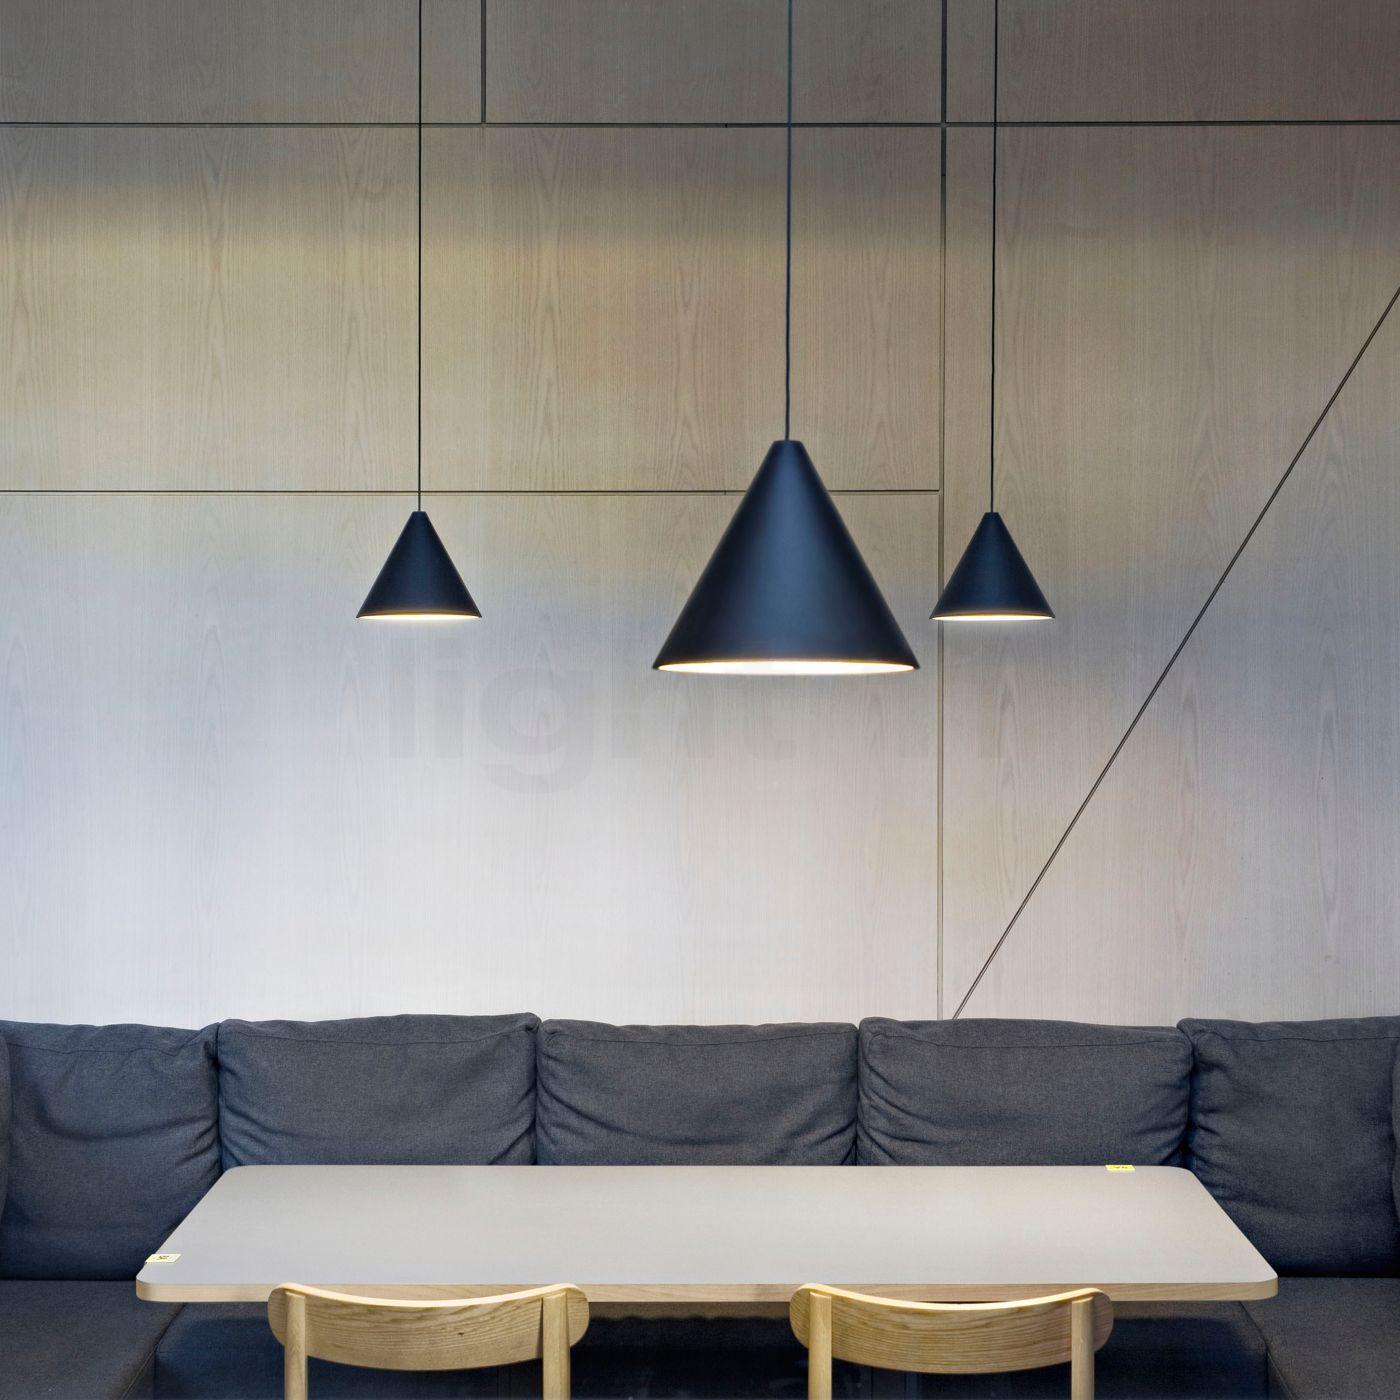 & Flos String Light Decentralised pendant lights - light11.eu azcodes.com